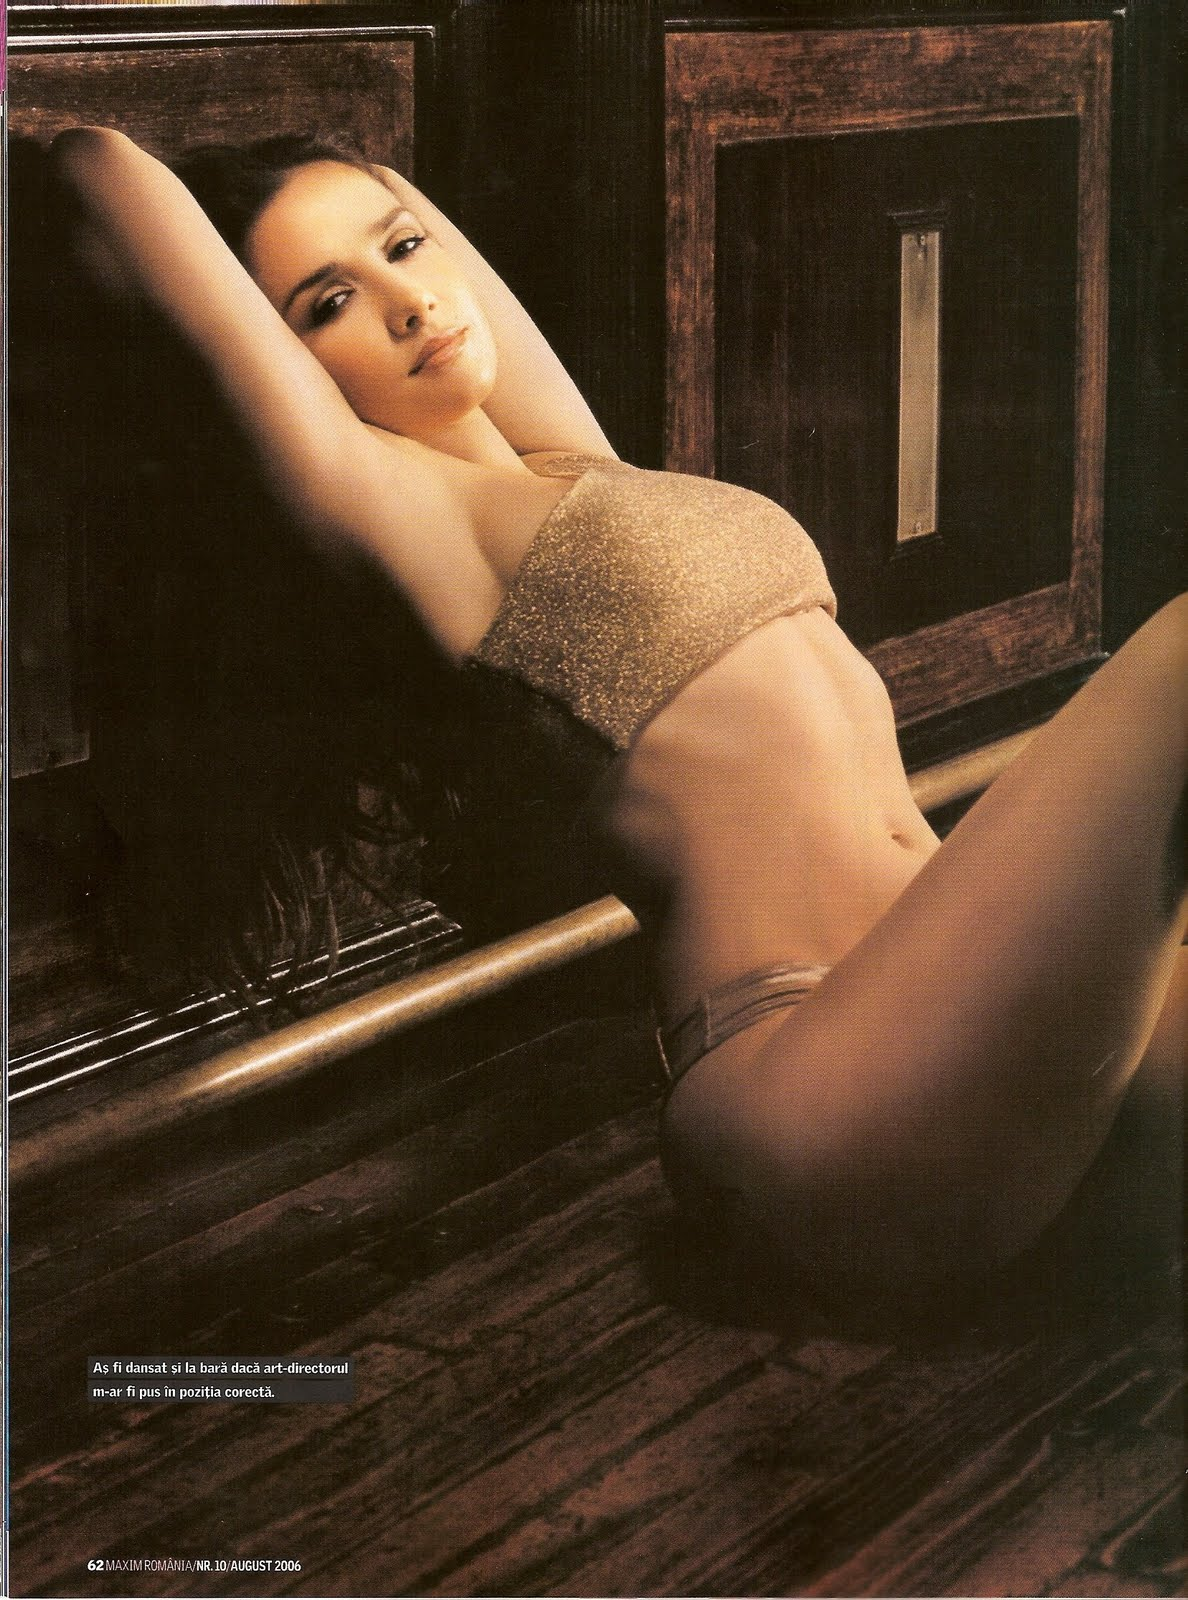 Юлия зимина фото в журнале 5 фотография